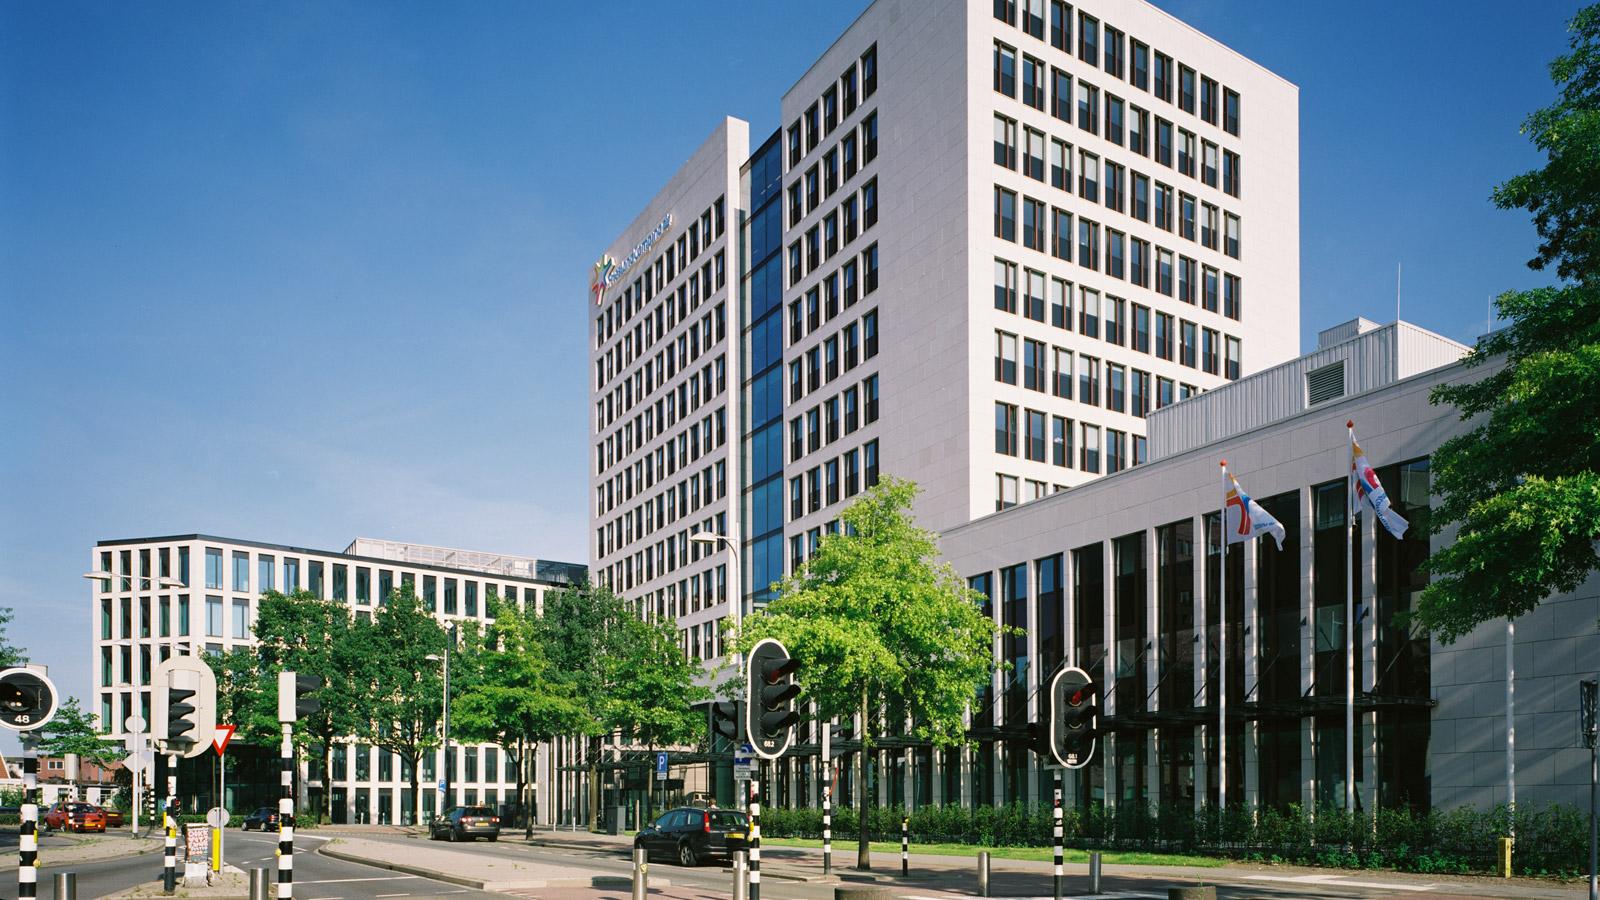 OZ - architecture, urbanism and design research